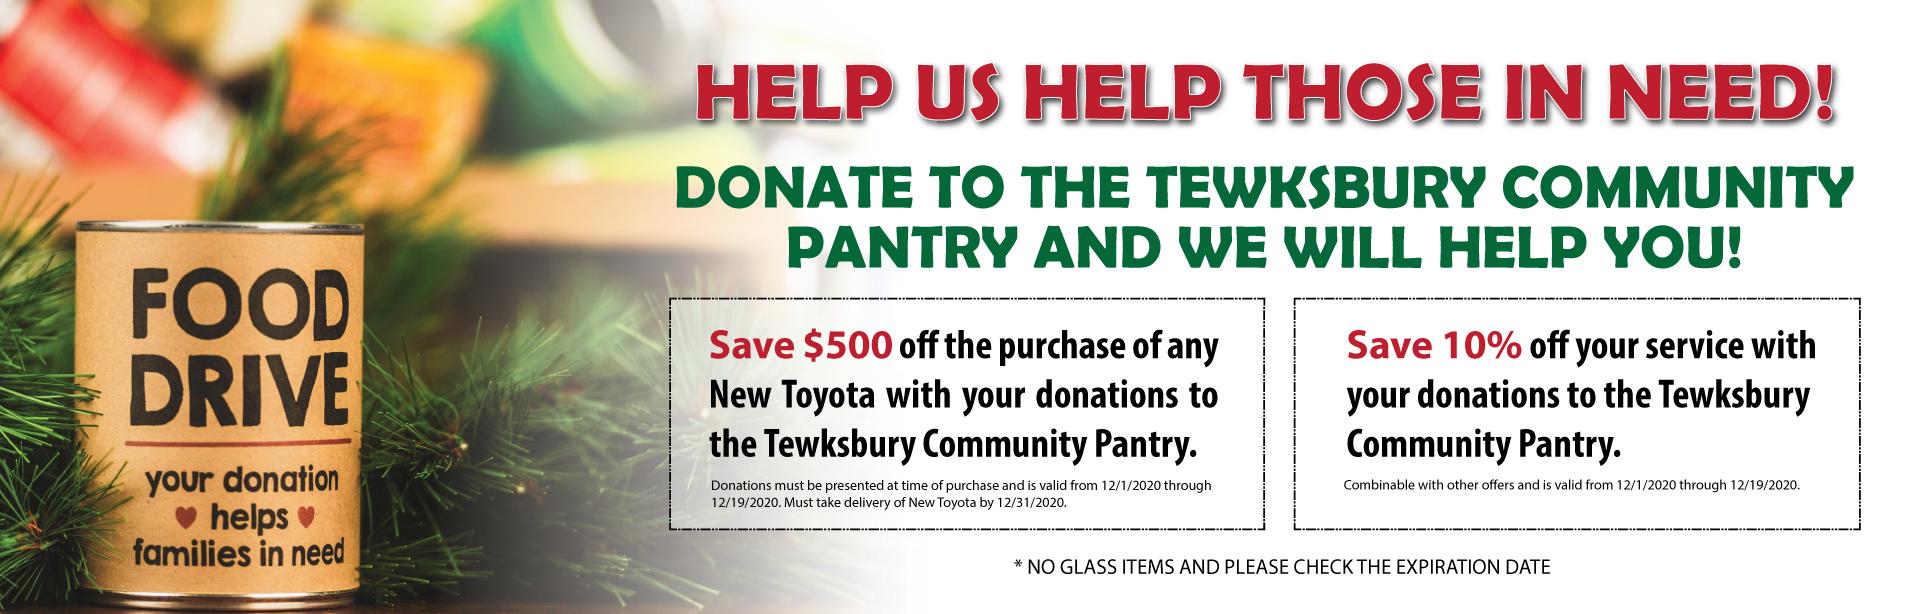 banner_toyota_ira-tewks_donate-food-pantry